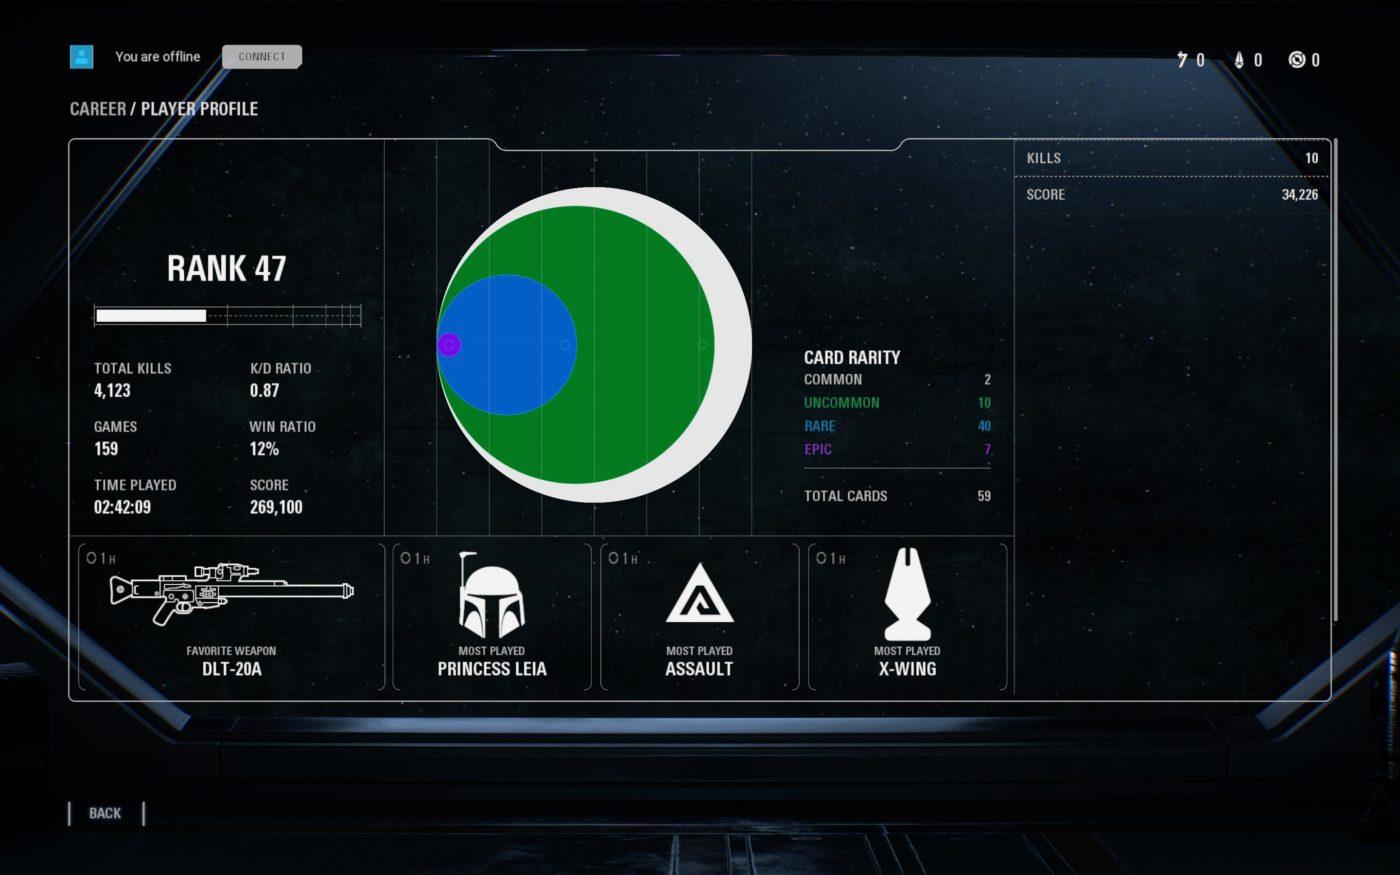 star-wars-battlefront-2-stats-page.jpg